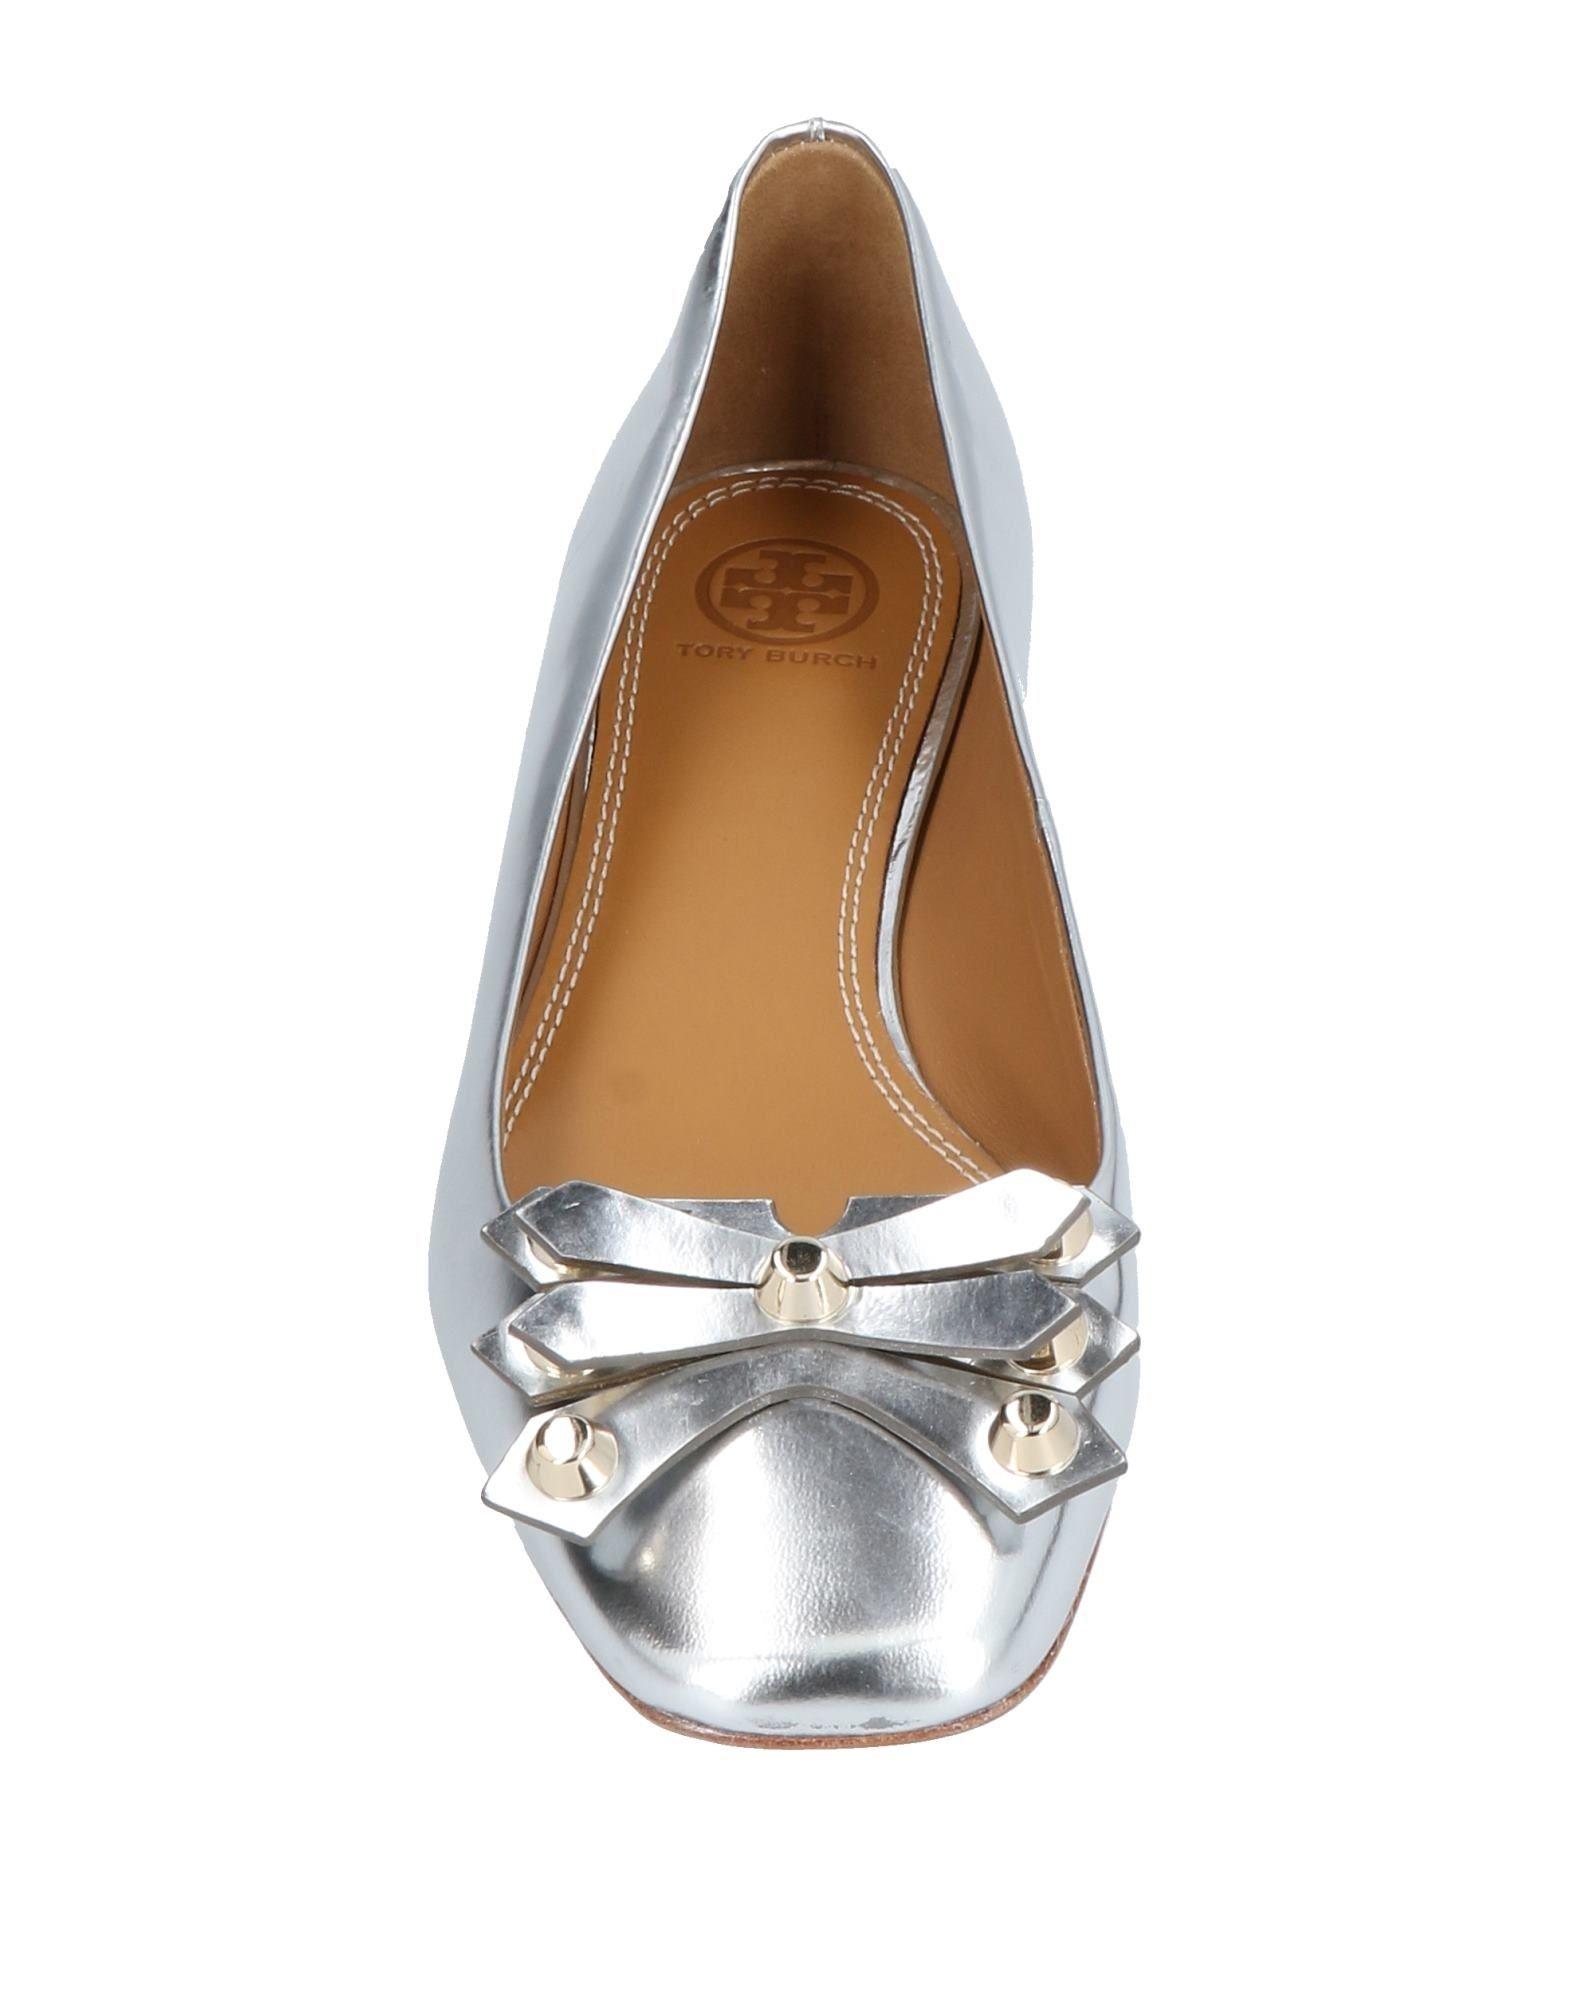 Tory Burch Ballerinas Damen Schuhe  11438638DR Neue Schuhe Damen dc5c95